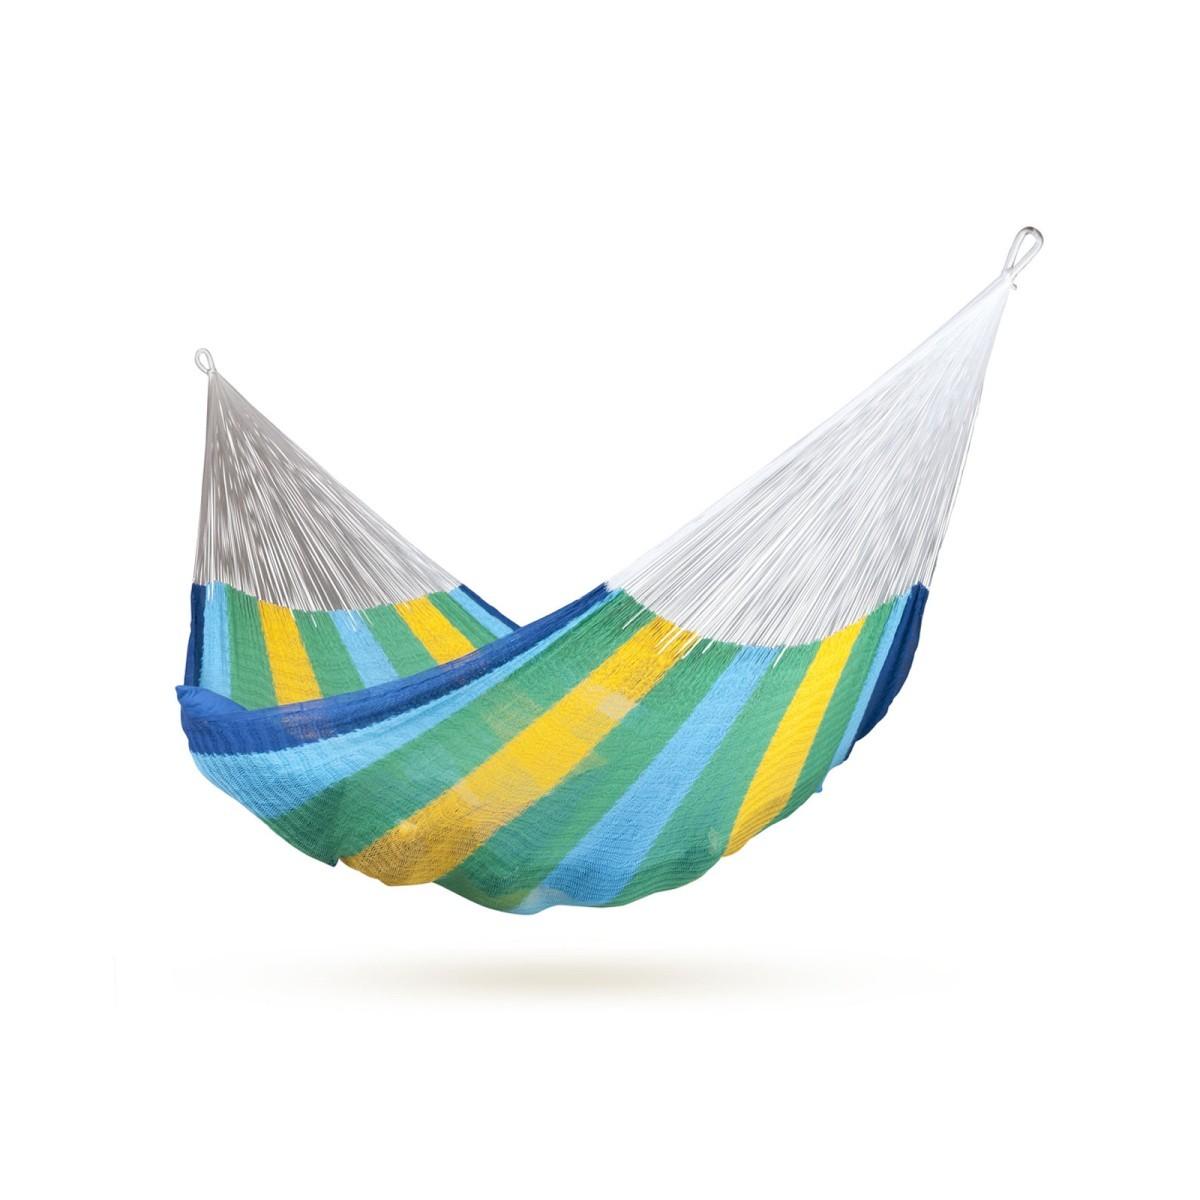 la siesta hamac filet mexicana canaria. Black Bedroom Furniture Sets. Home Design Ideas